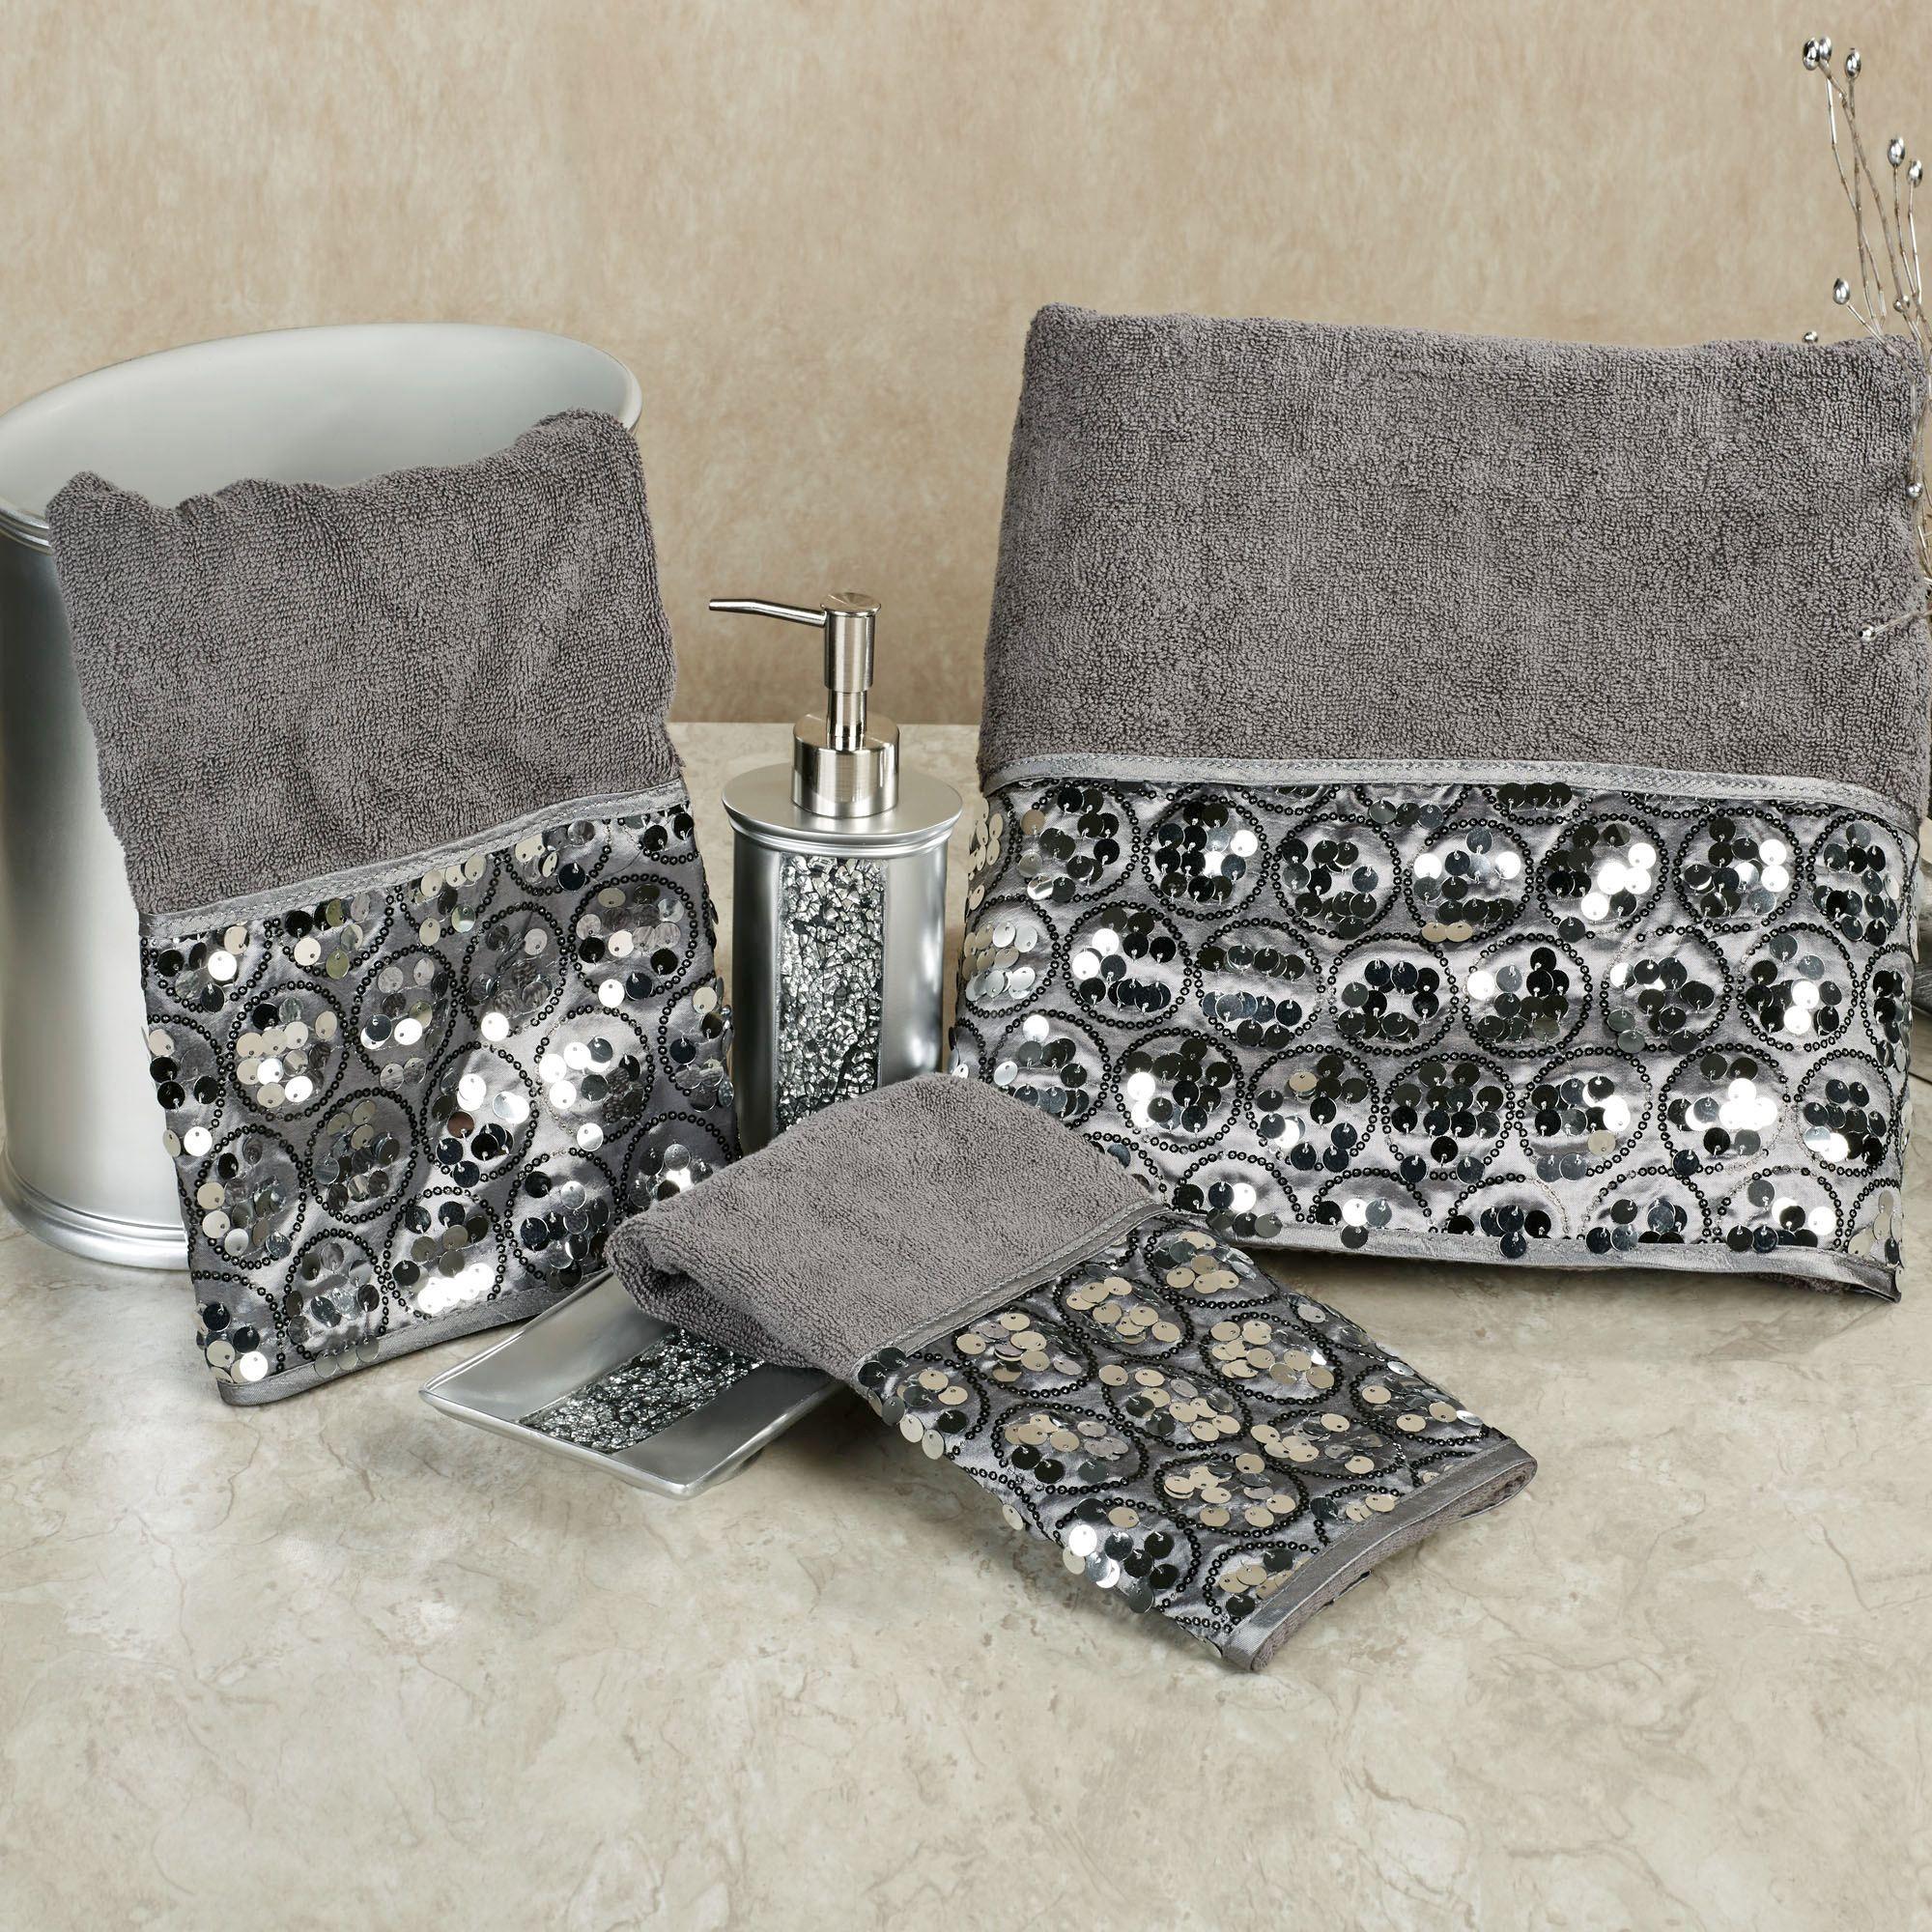 bathroom towels and accessories ideas pinterest bathroom